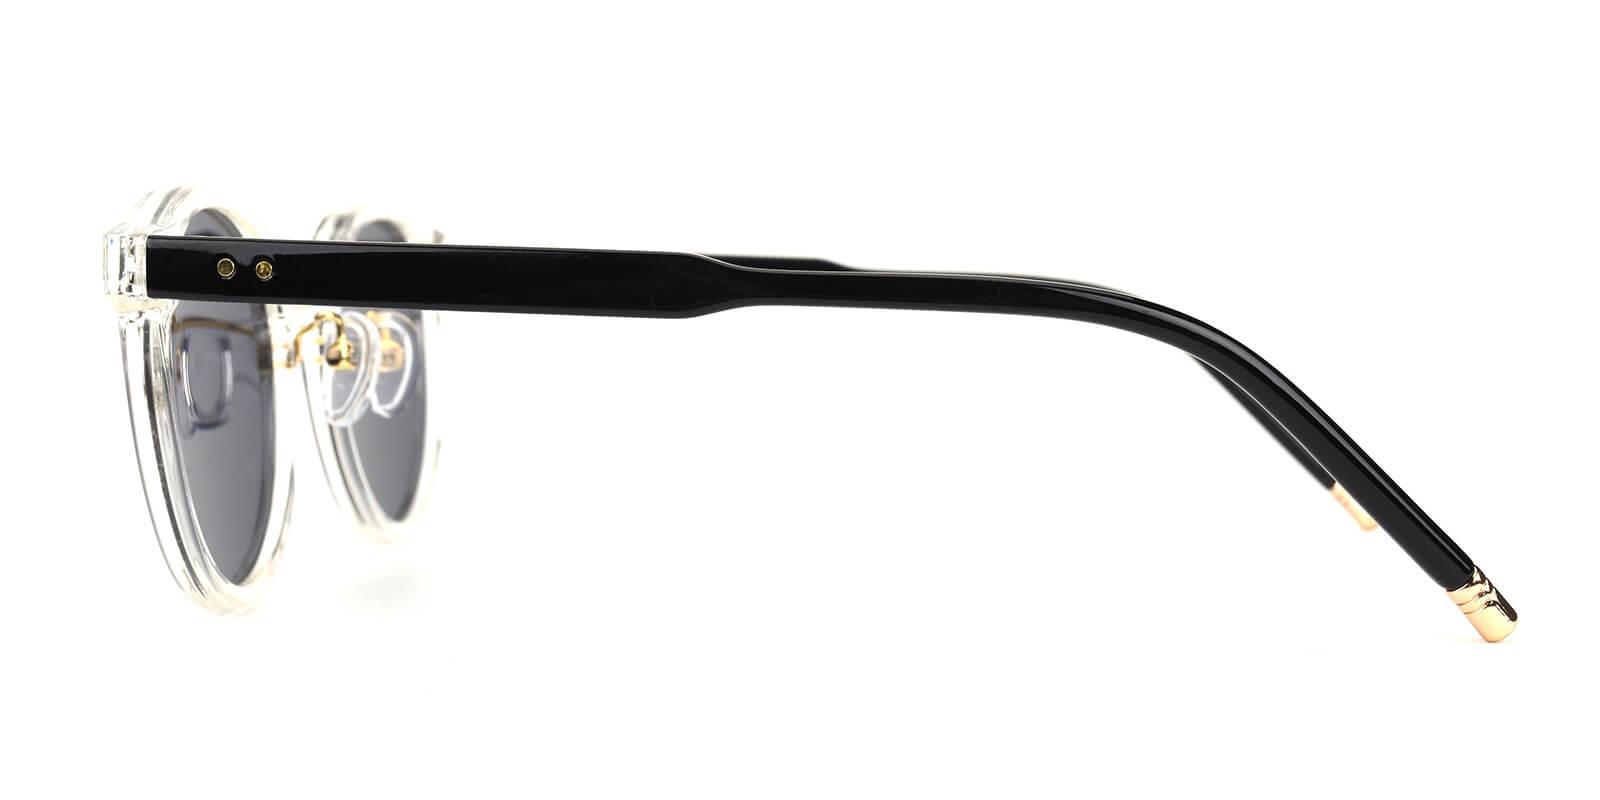 Chiny-Translucent-Round / Cat-TR-Sunglasses-additional3